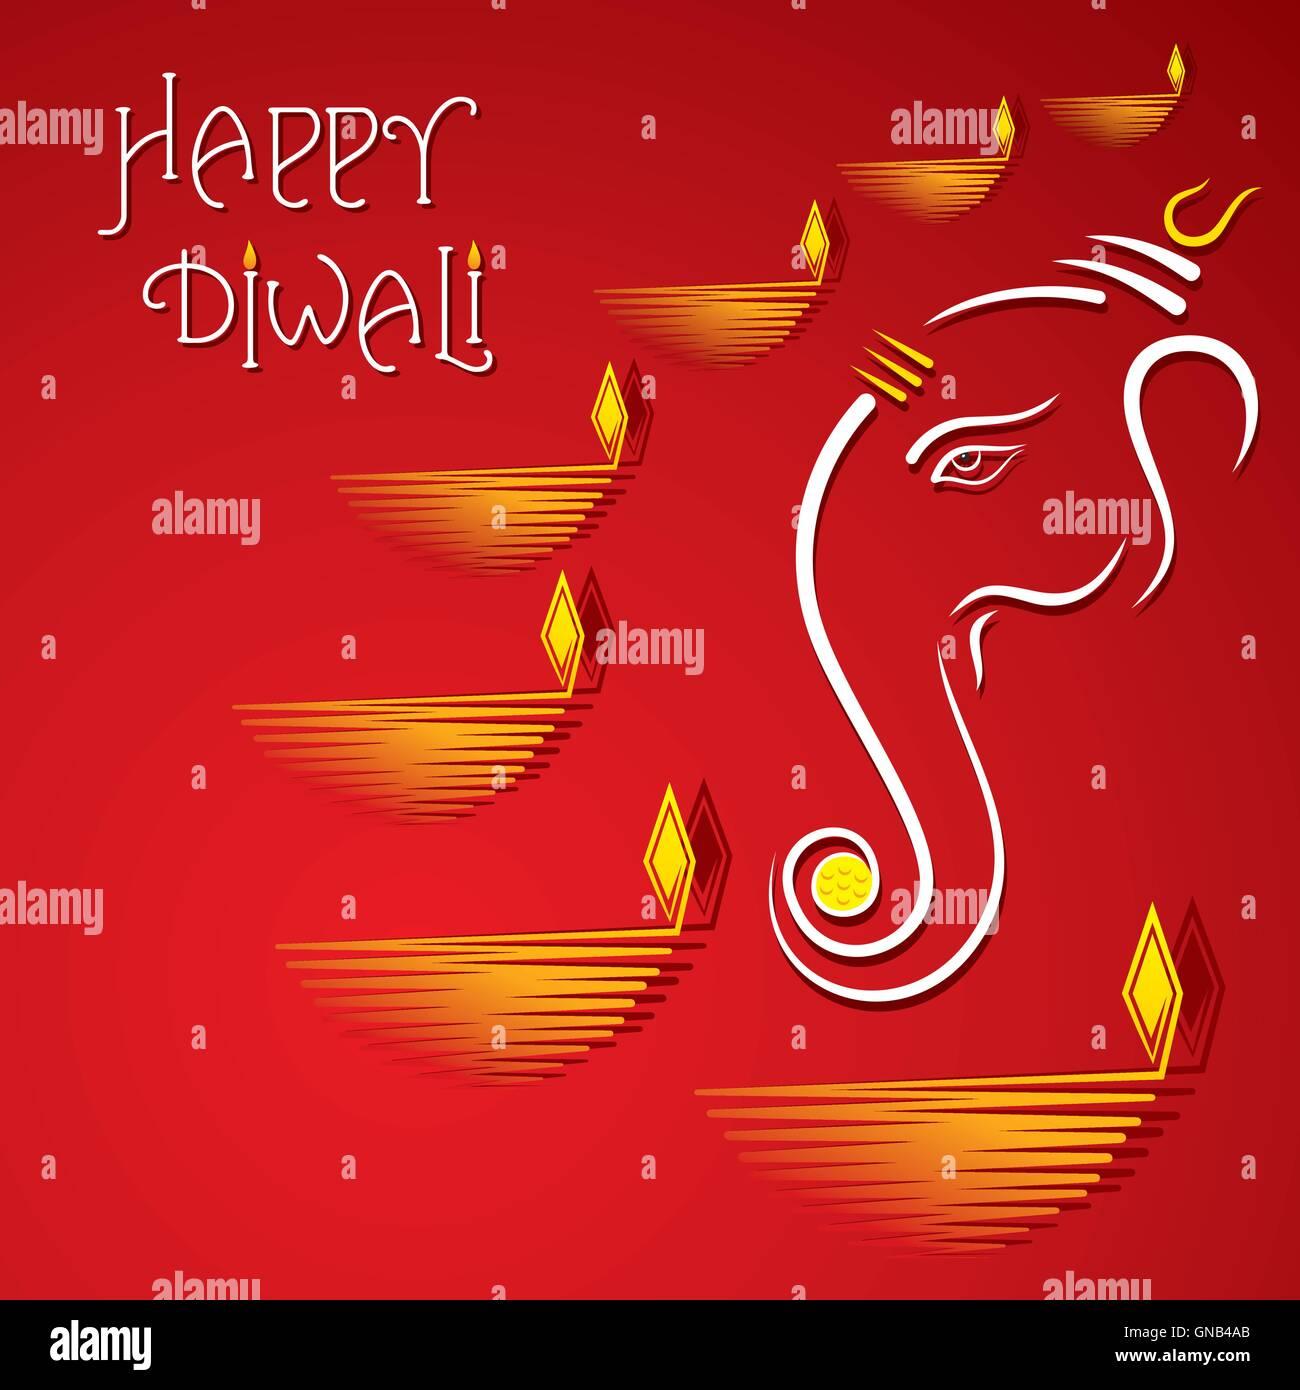 Happy diwali greeting card design stock vector art illustration happy diwali greeting card design kristyandbryce Choice Image